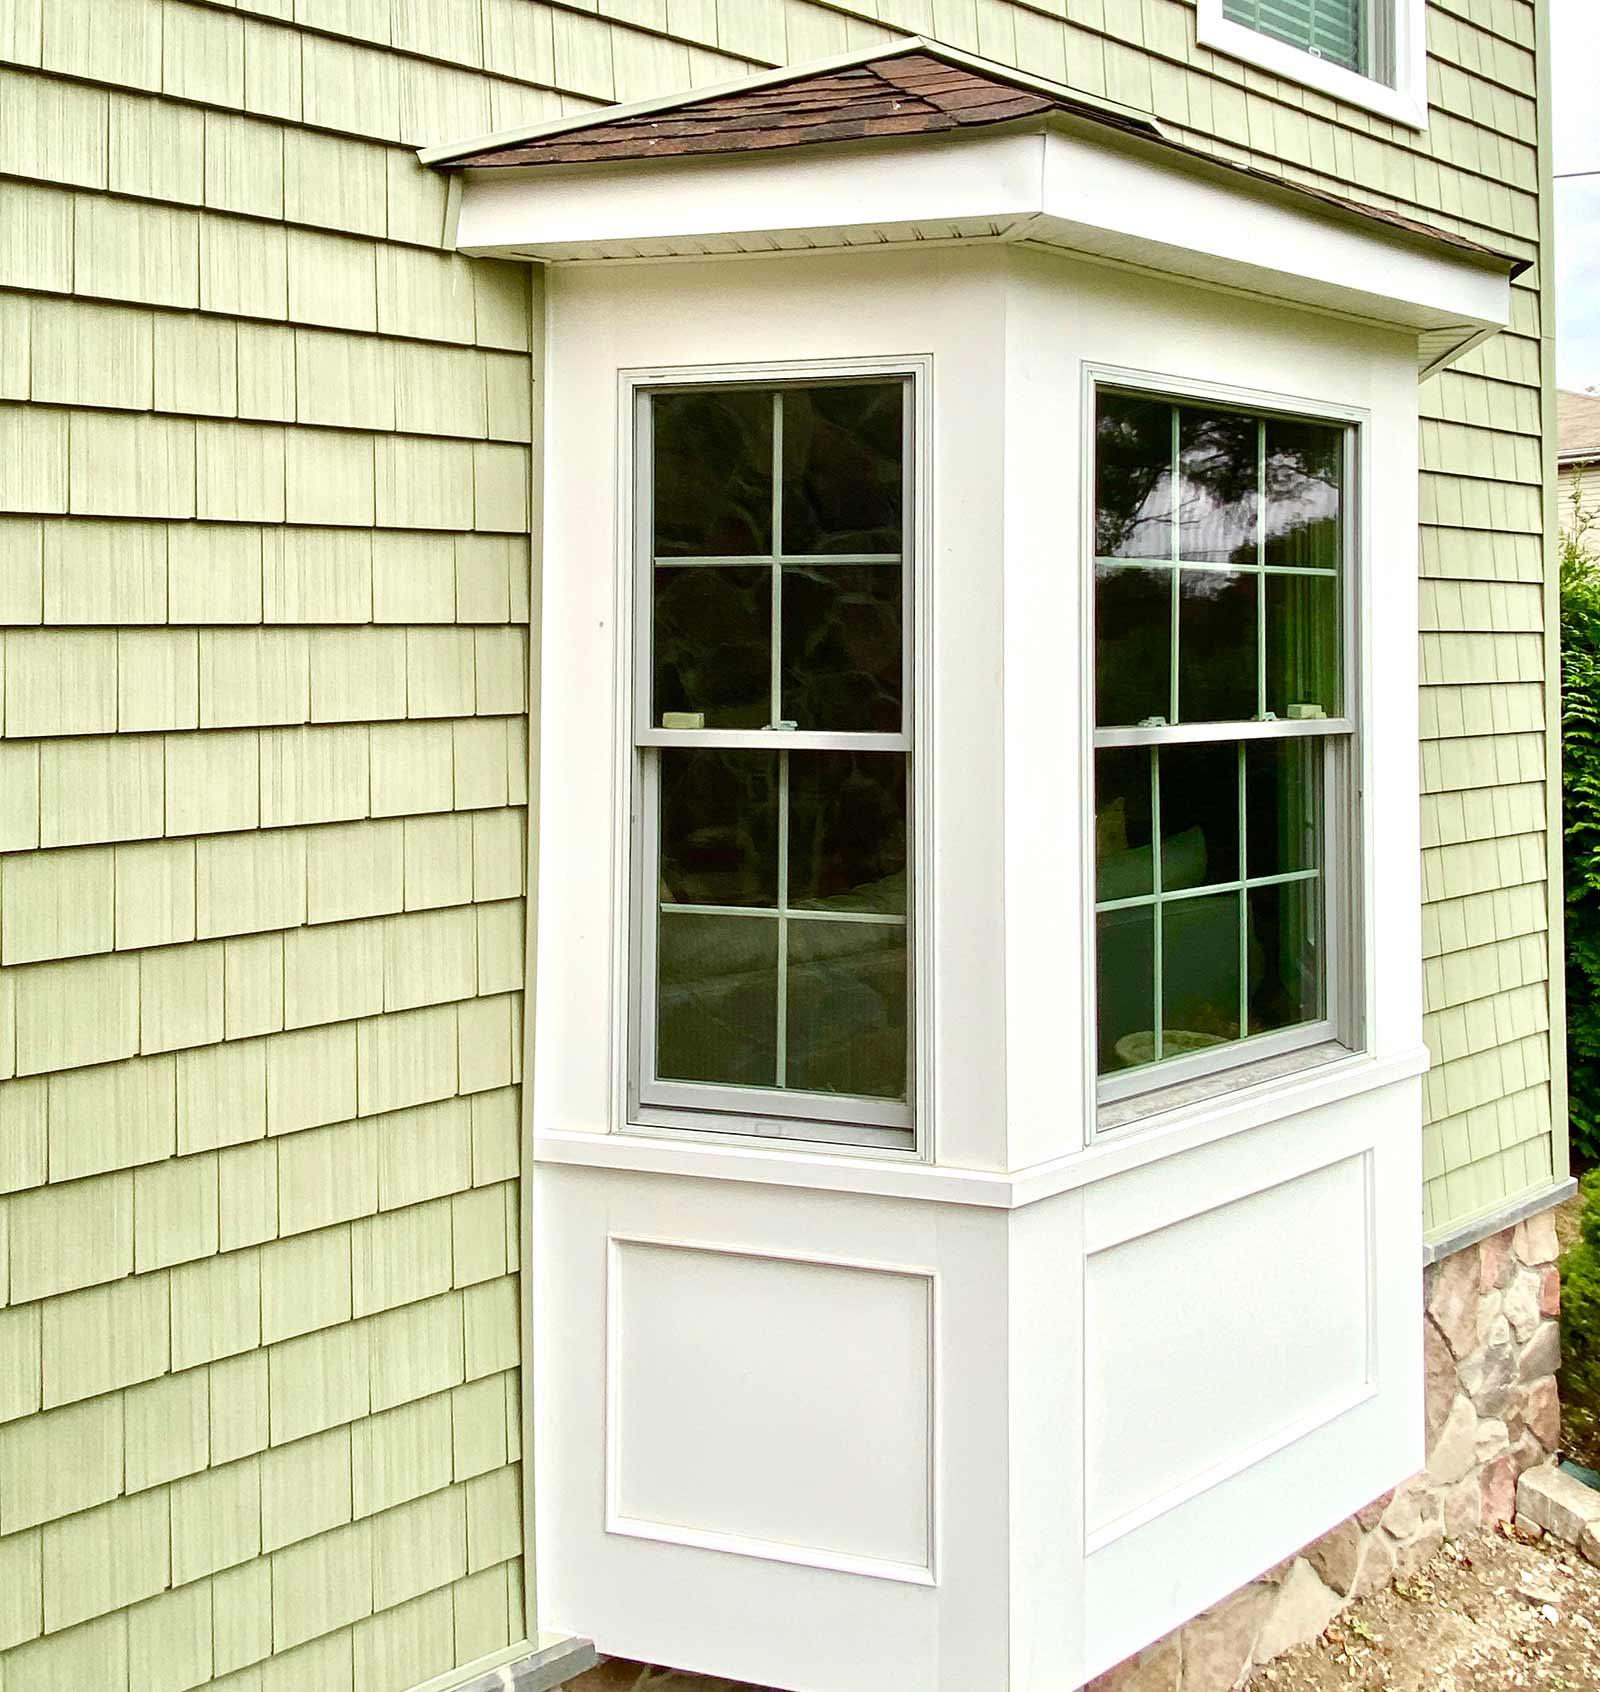 Pella-Lifestyle-Double-Hung-Windows-in-Morris-County-NJ